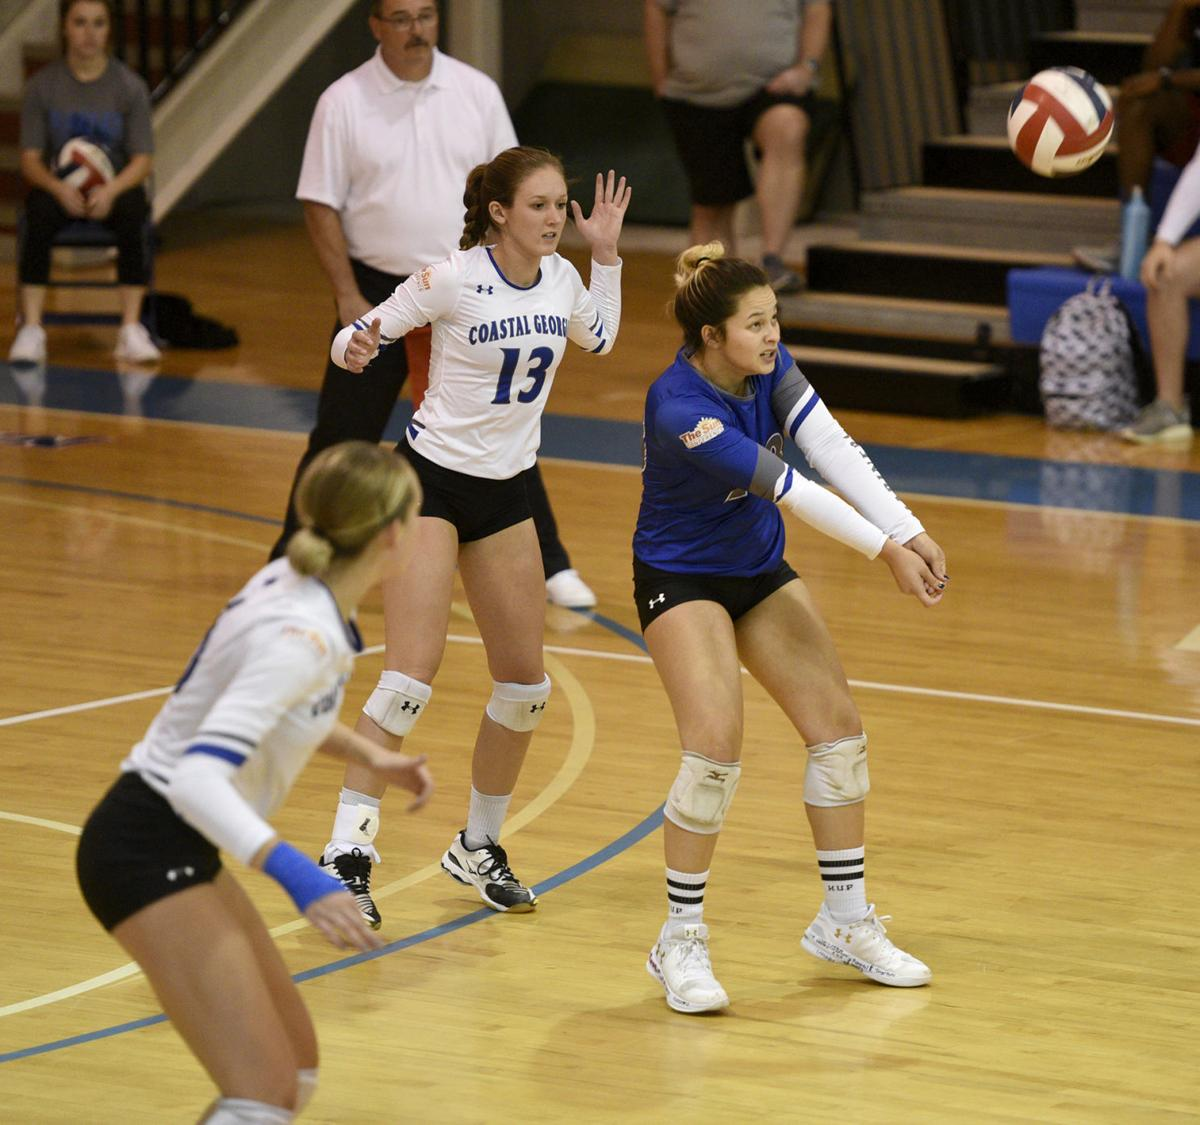 110718_ccga kaiser volleyball 8